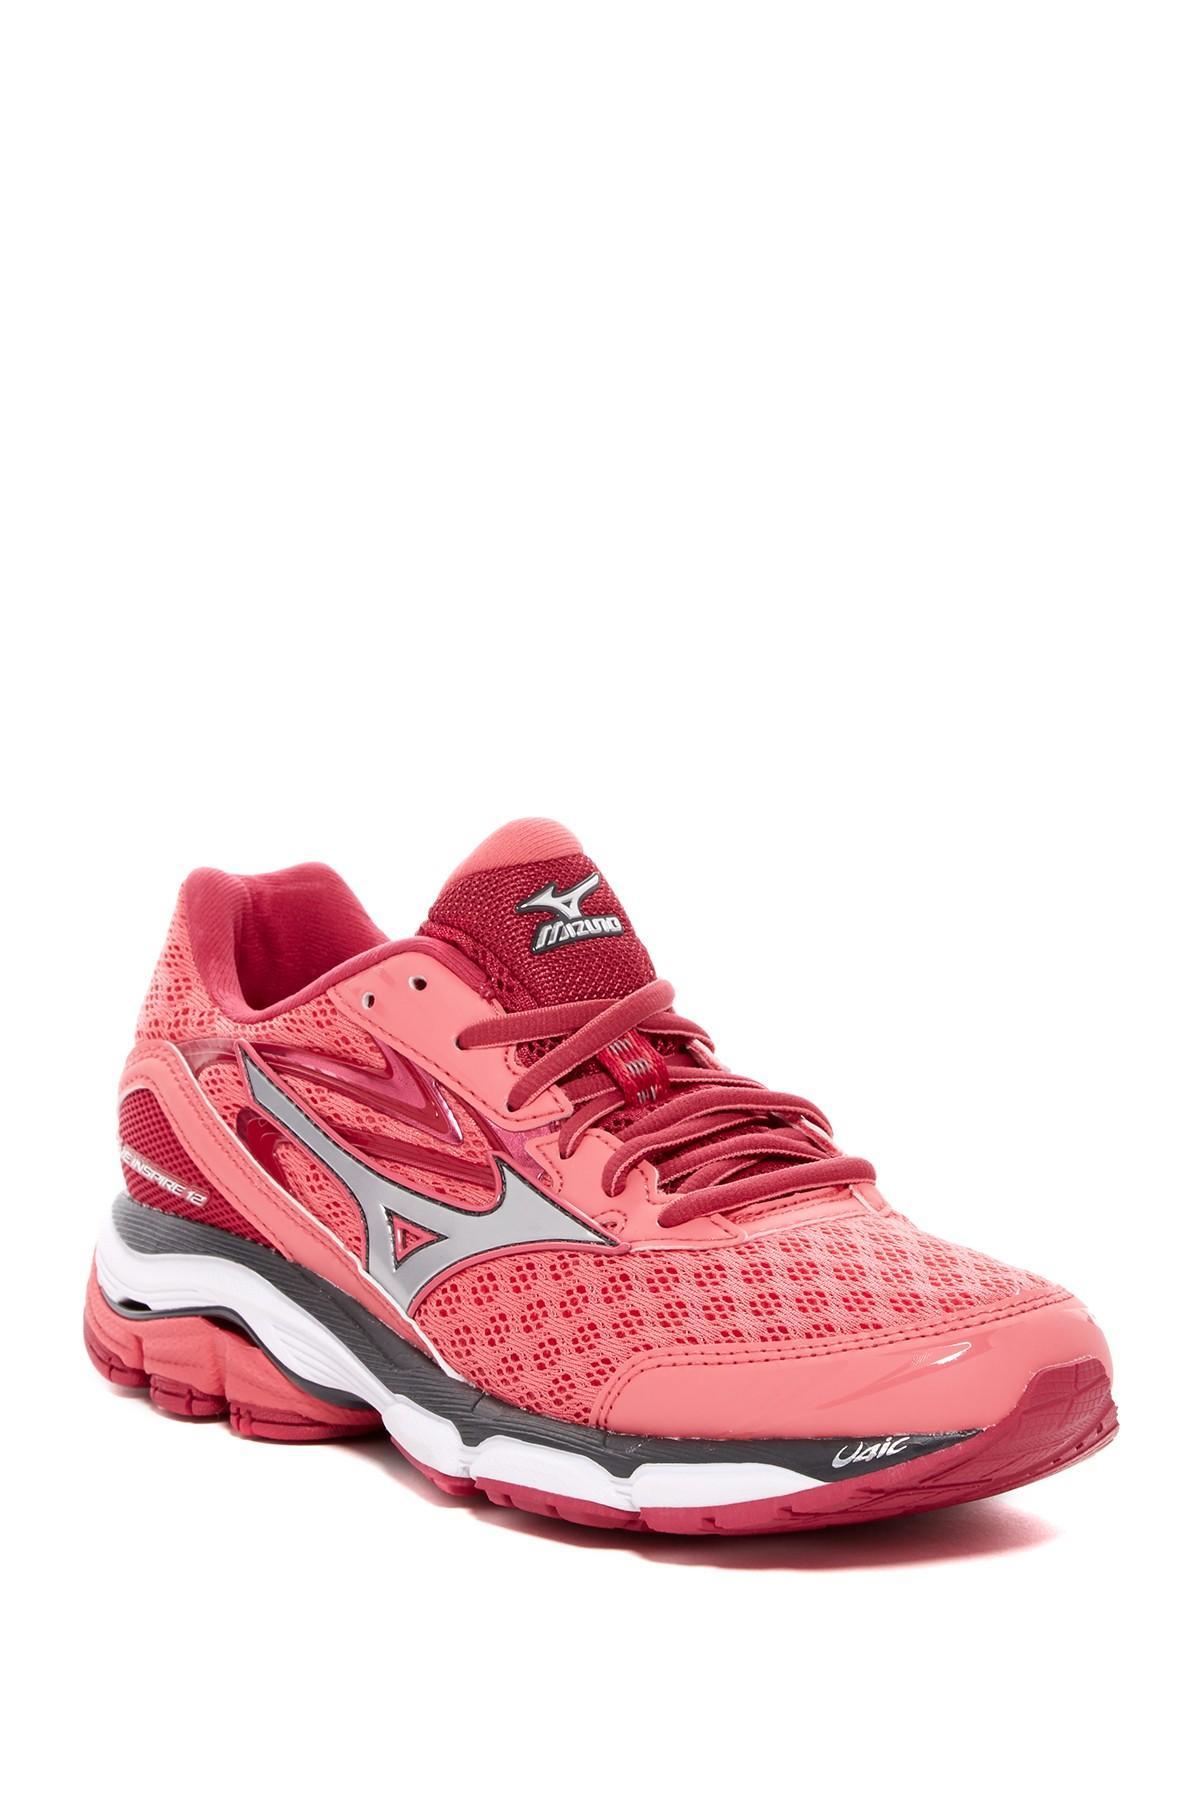 Nordstrom Mizuno Running Shoes